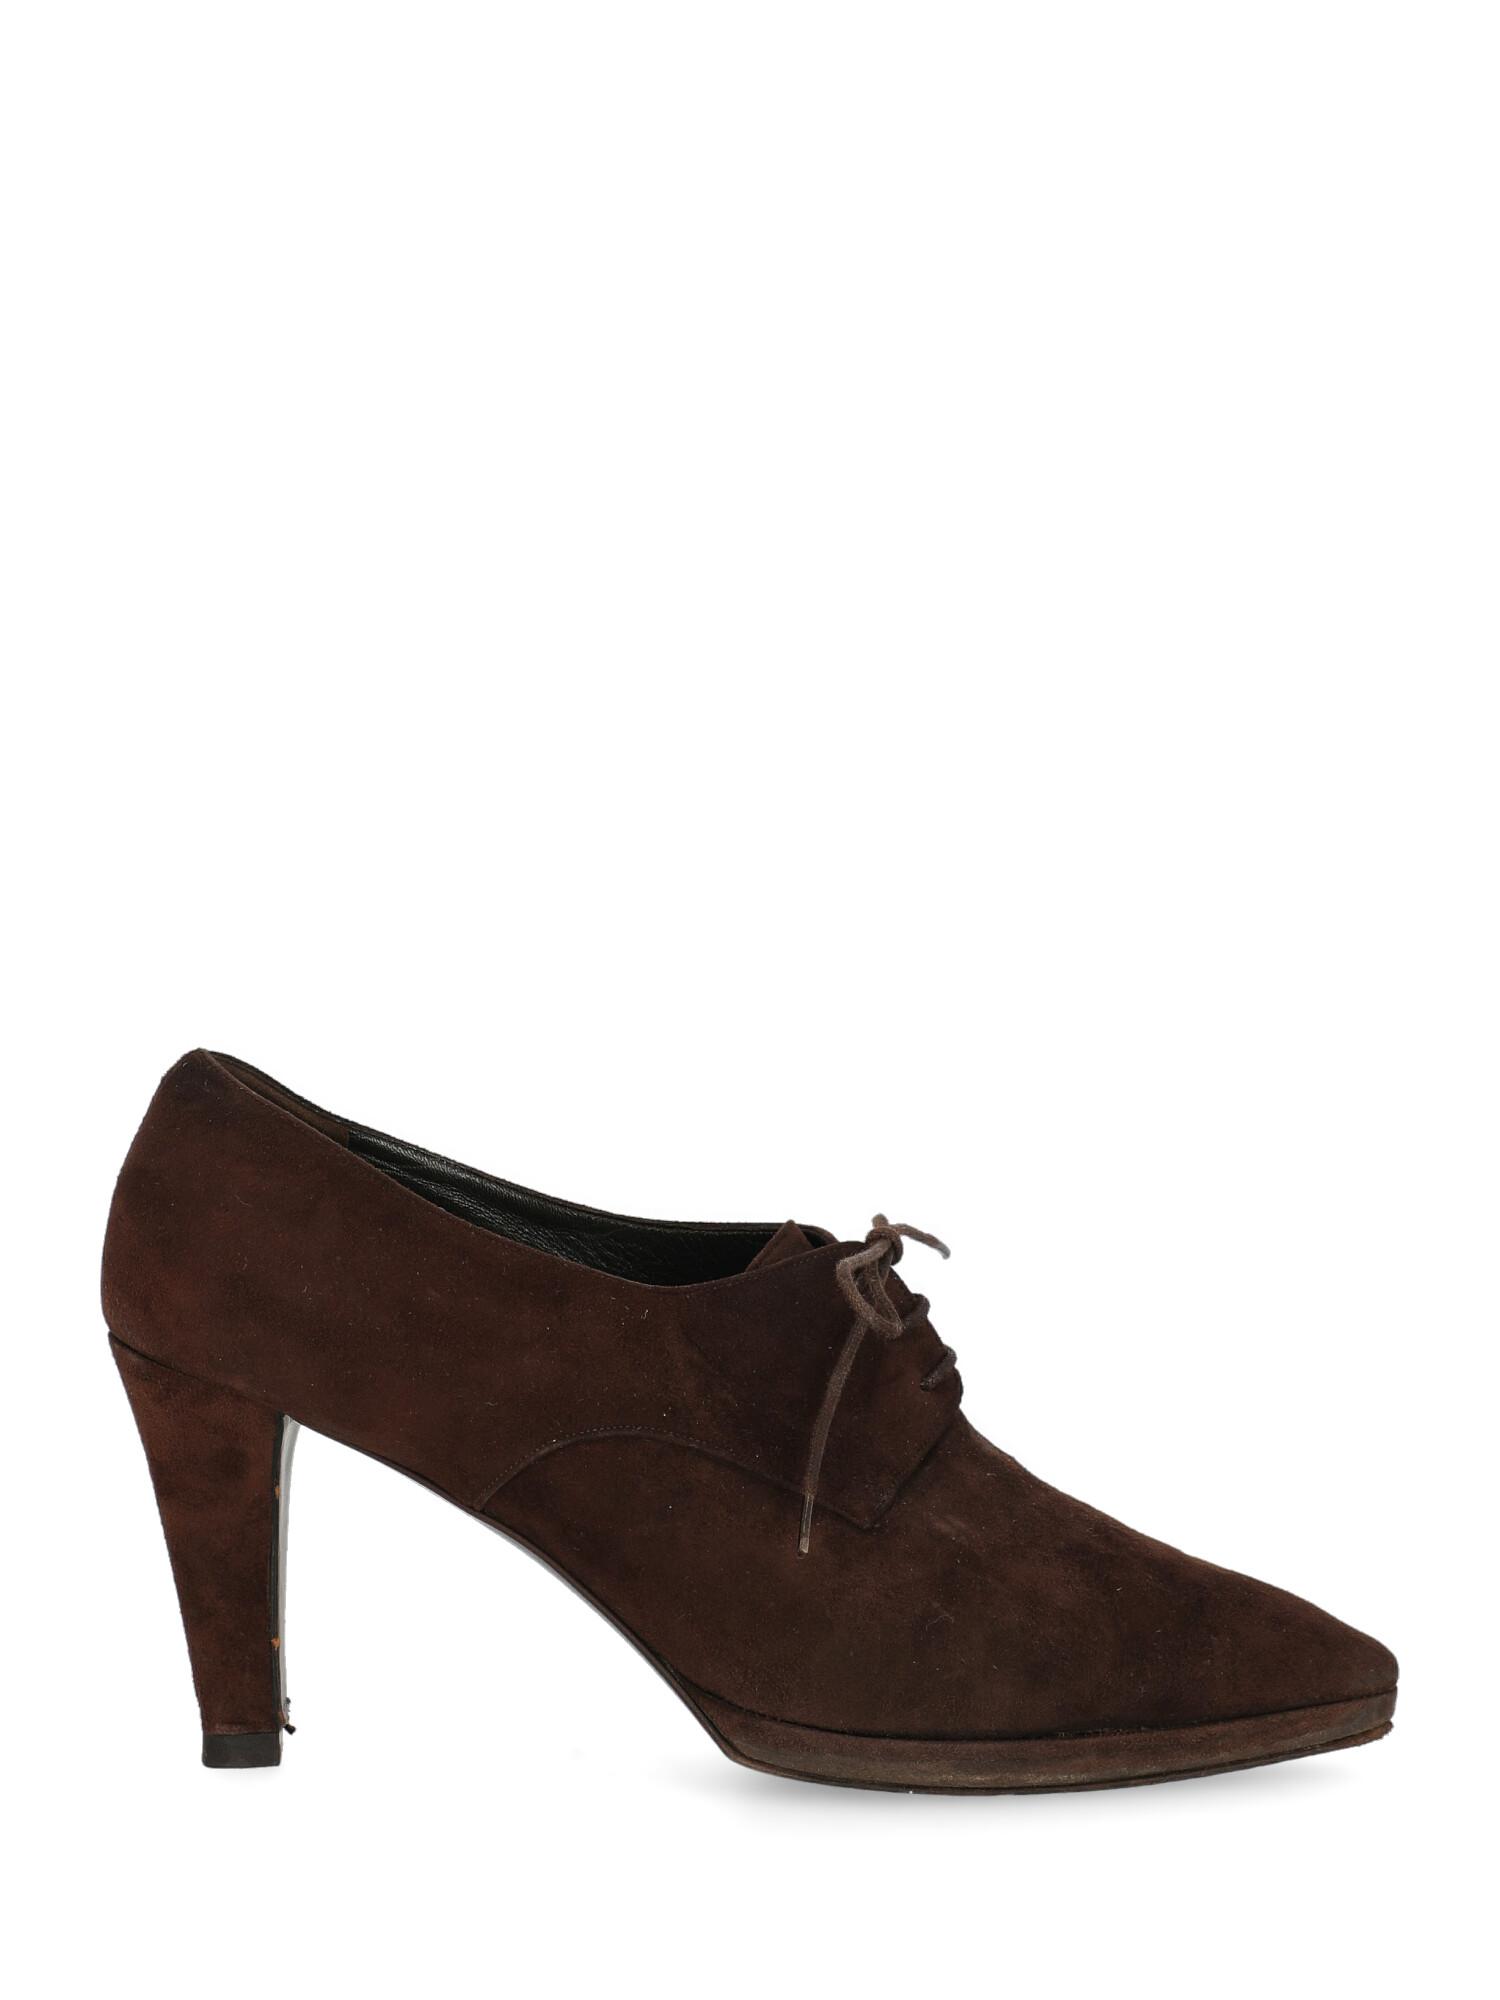 Pre-owned Prada Shoe In Brown